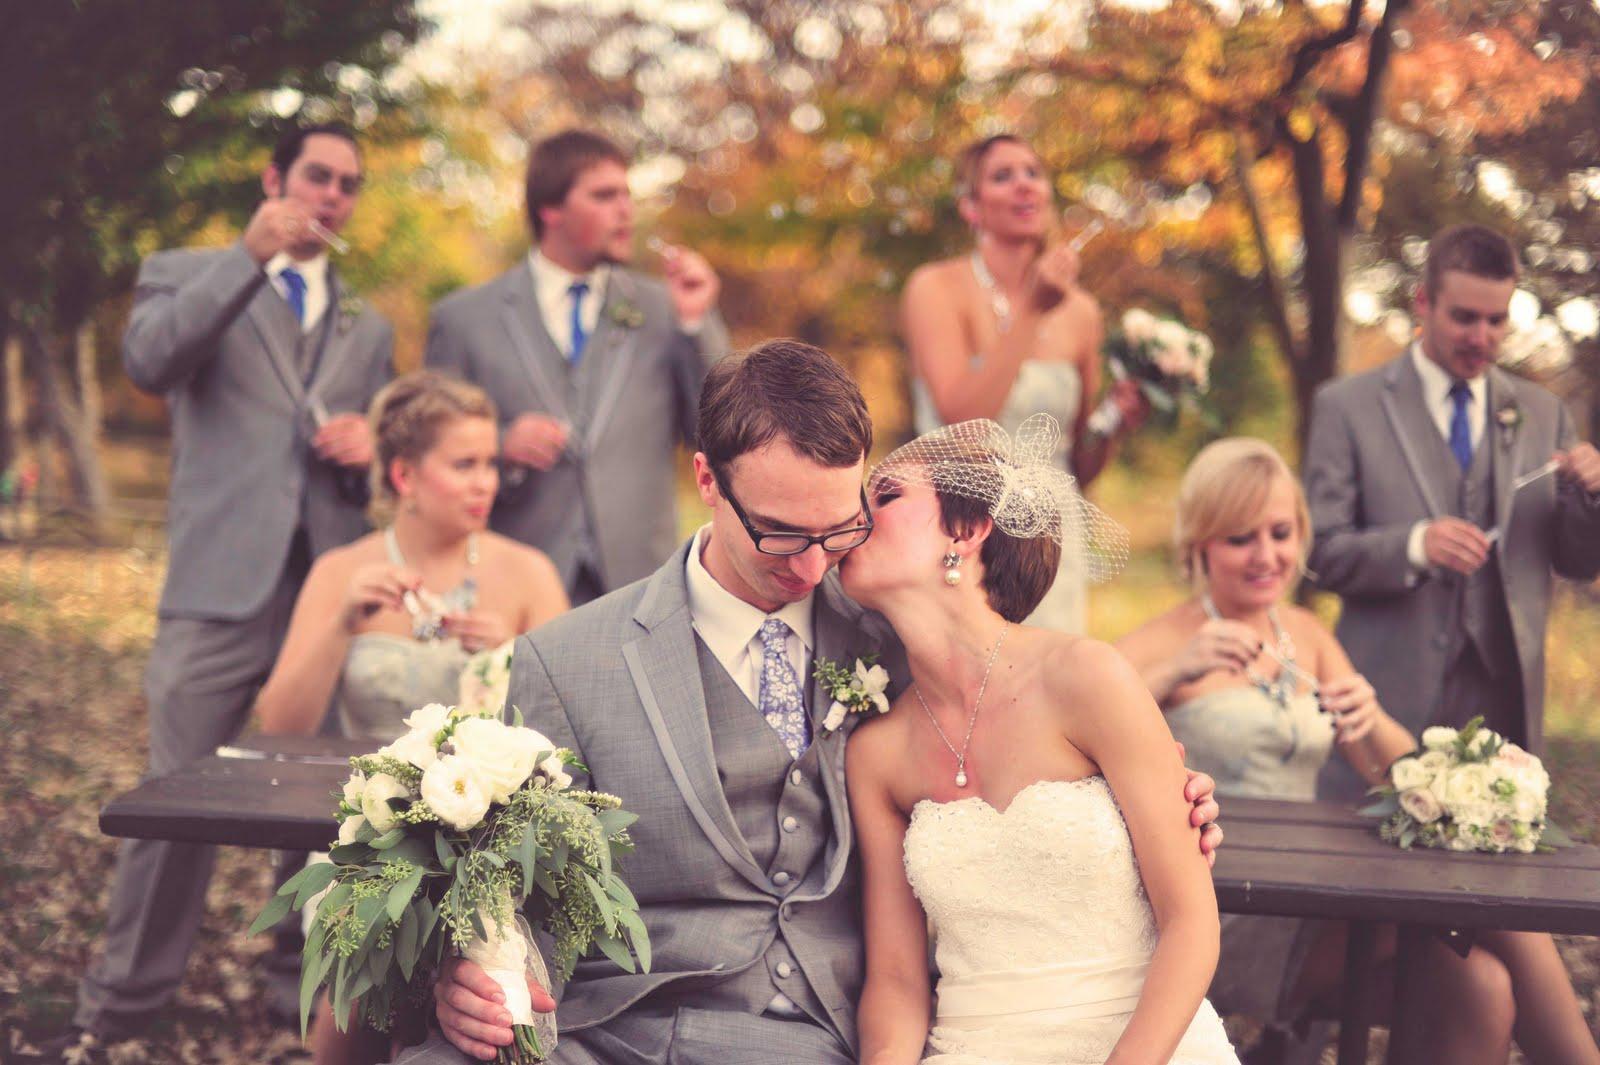 Outdoor Wedding Wedding Photography Photo Ideas Weddings Wedding Photos Bridal Parties